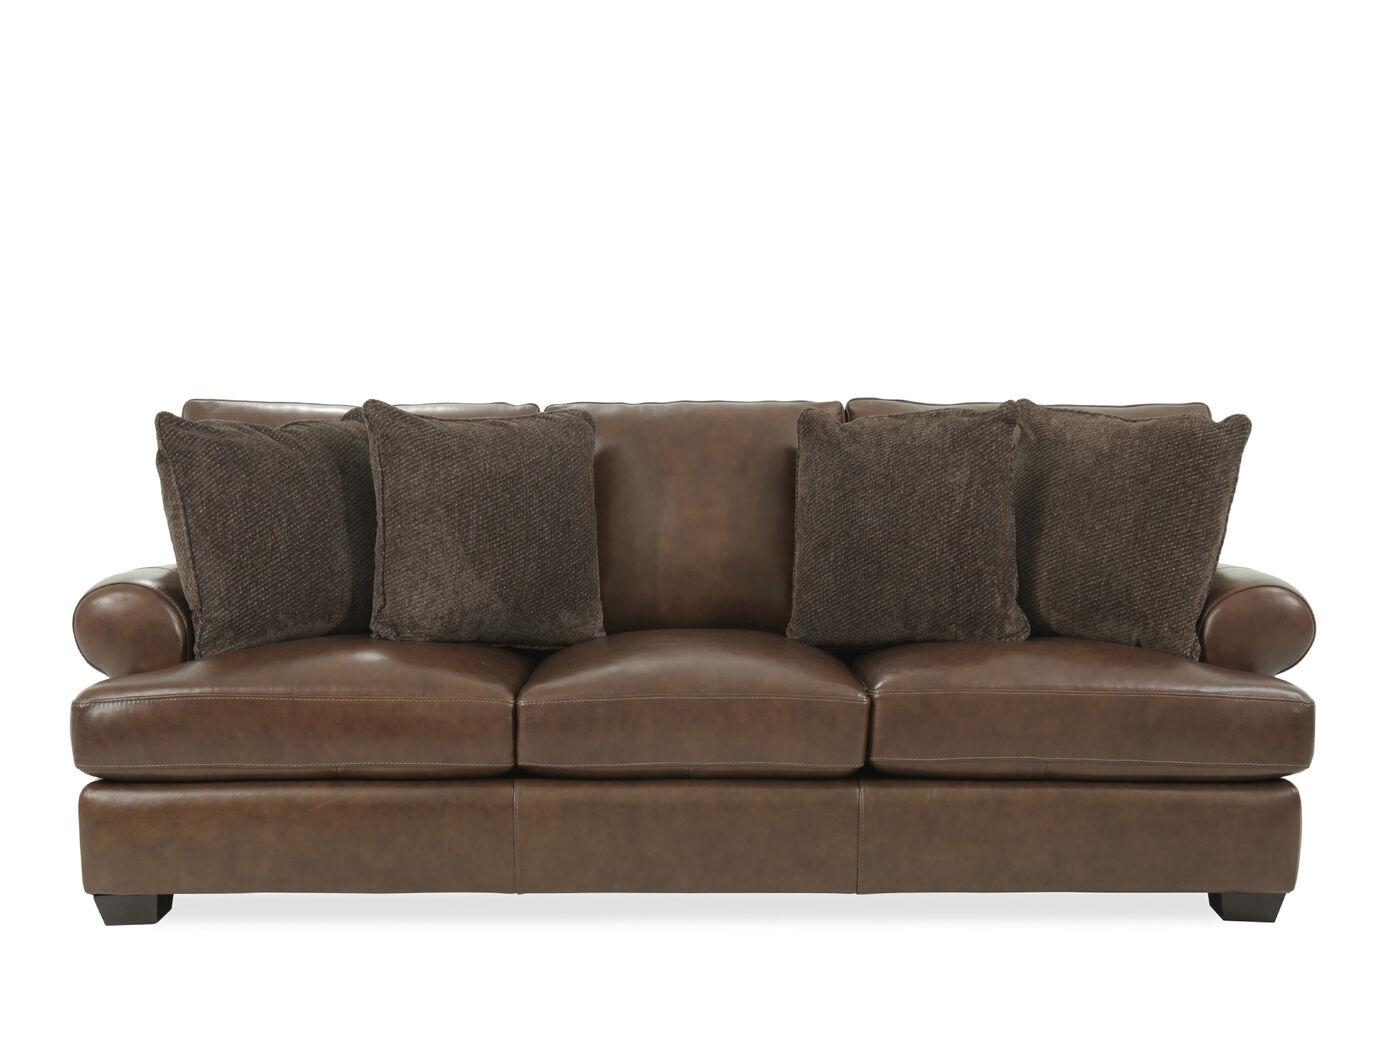 Bernhardt Tyson Brown Leather Sofa